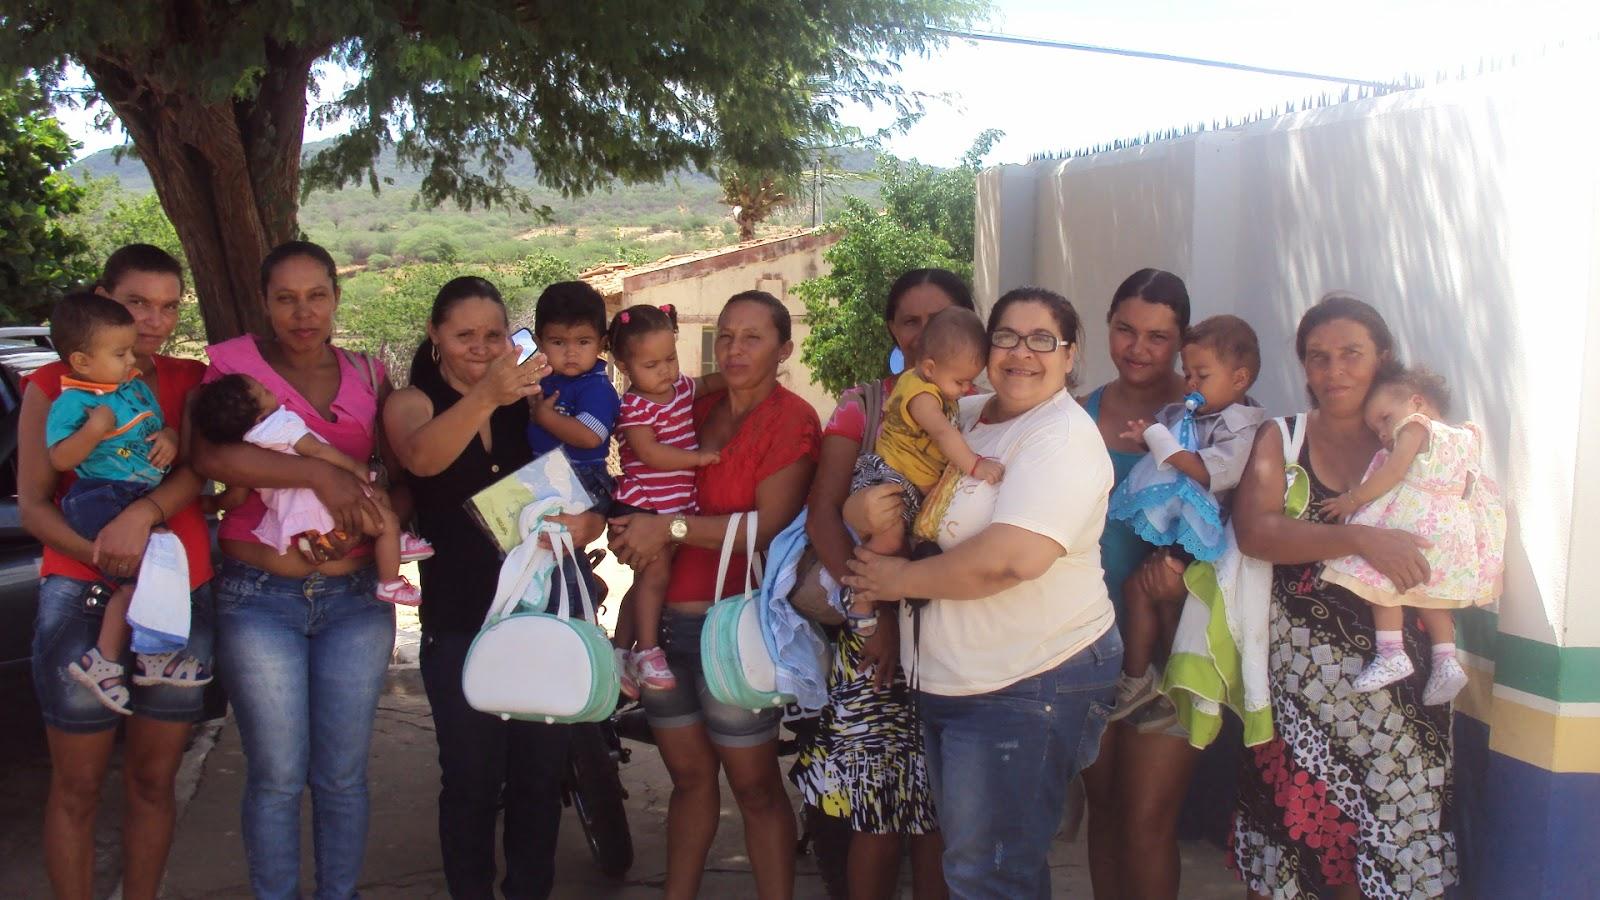 Programa Mãe Coruja Pernambucana: Serra Talhada - Mãe Coruja e ...